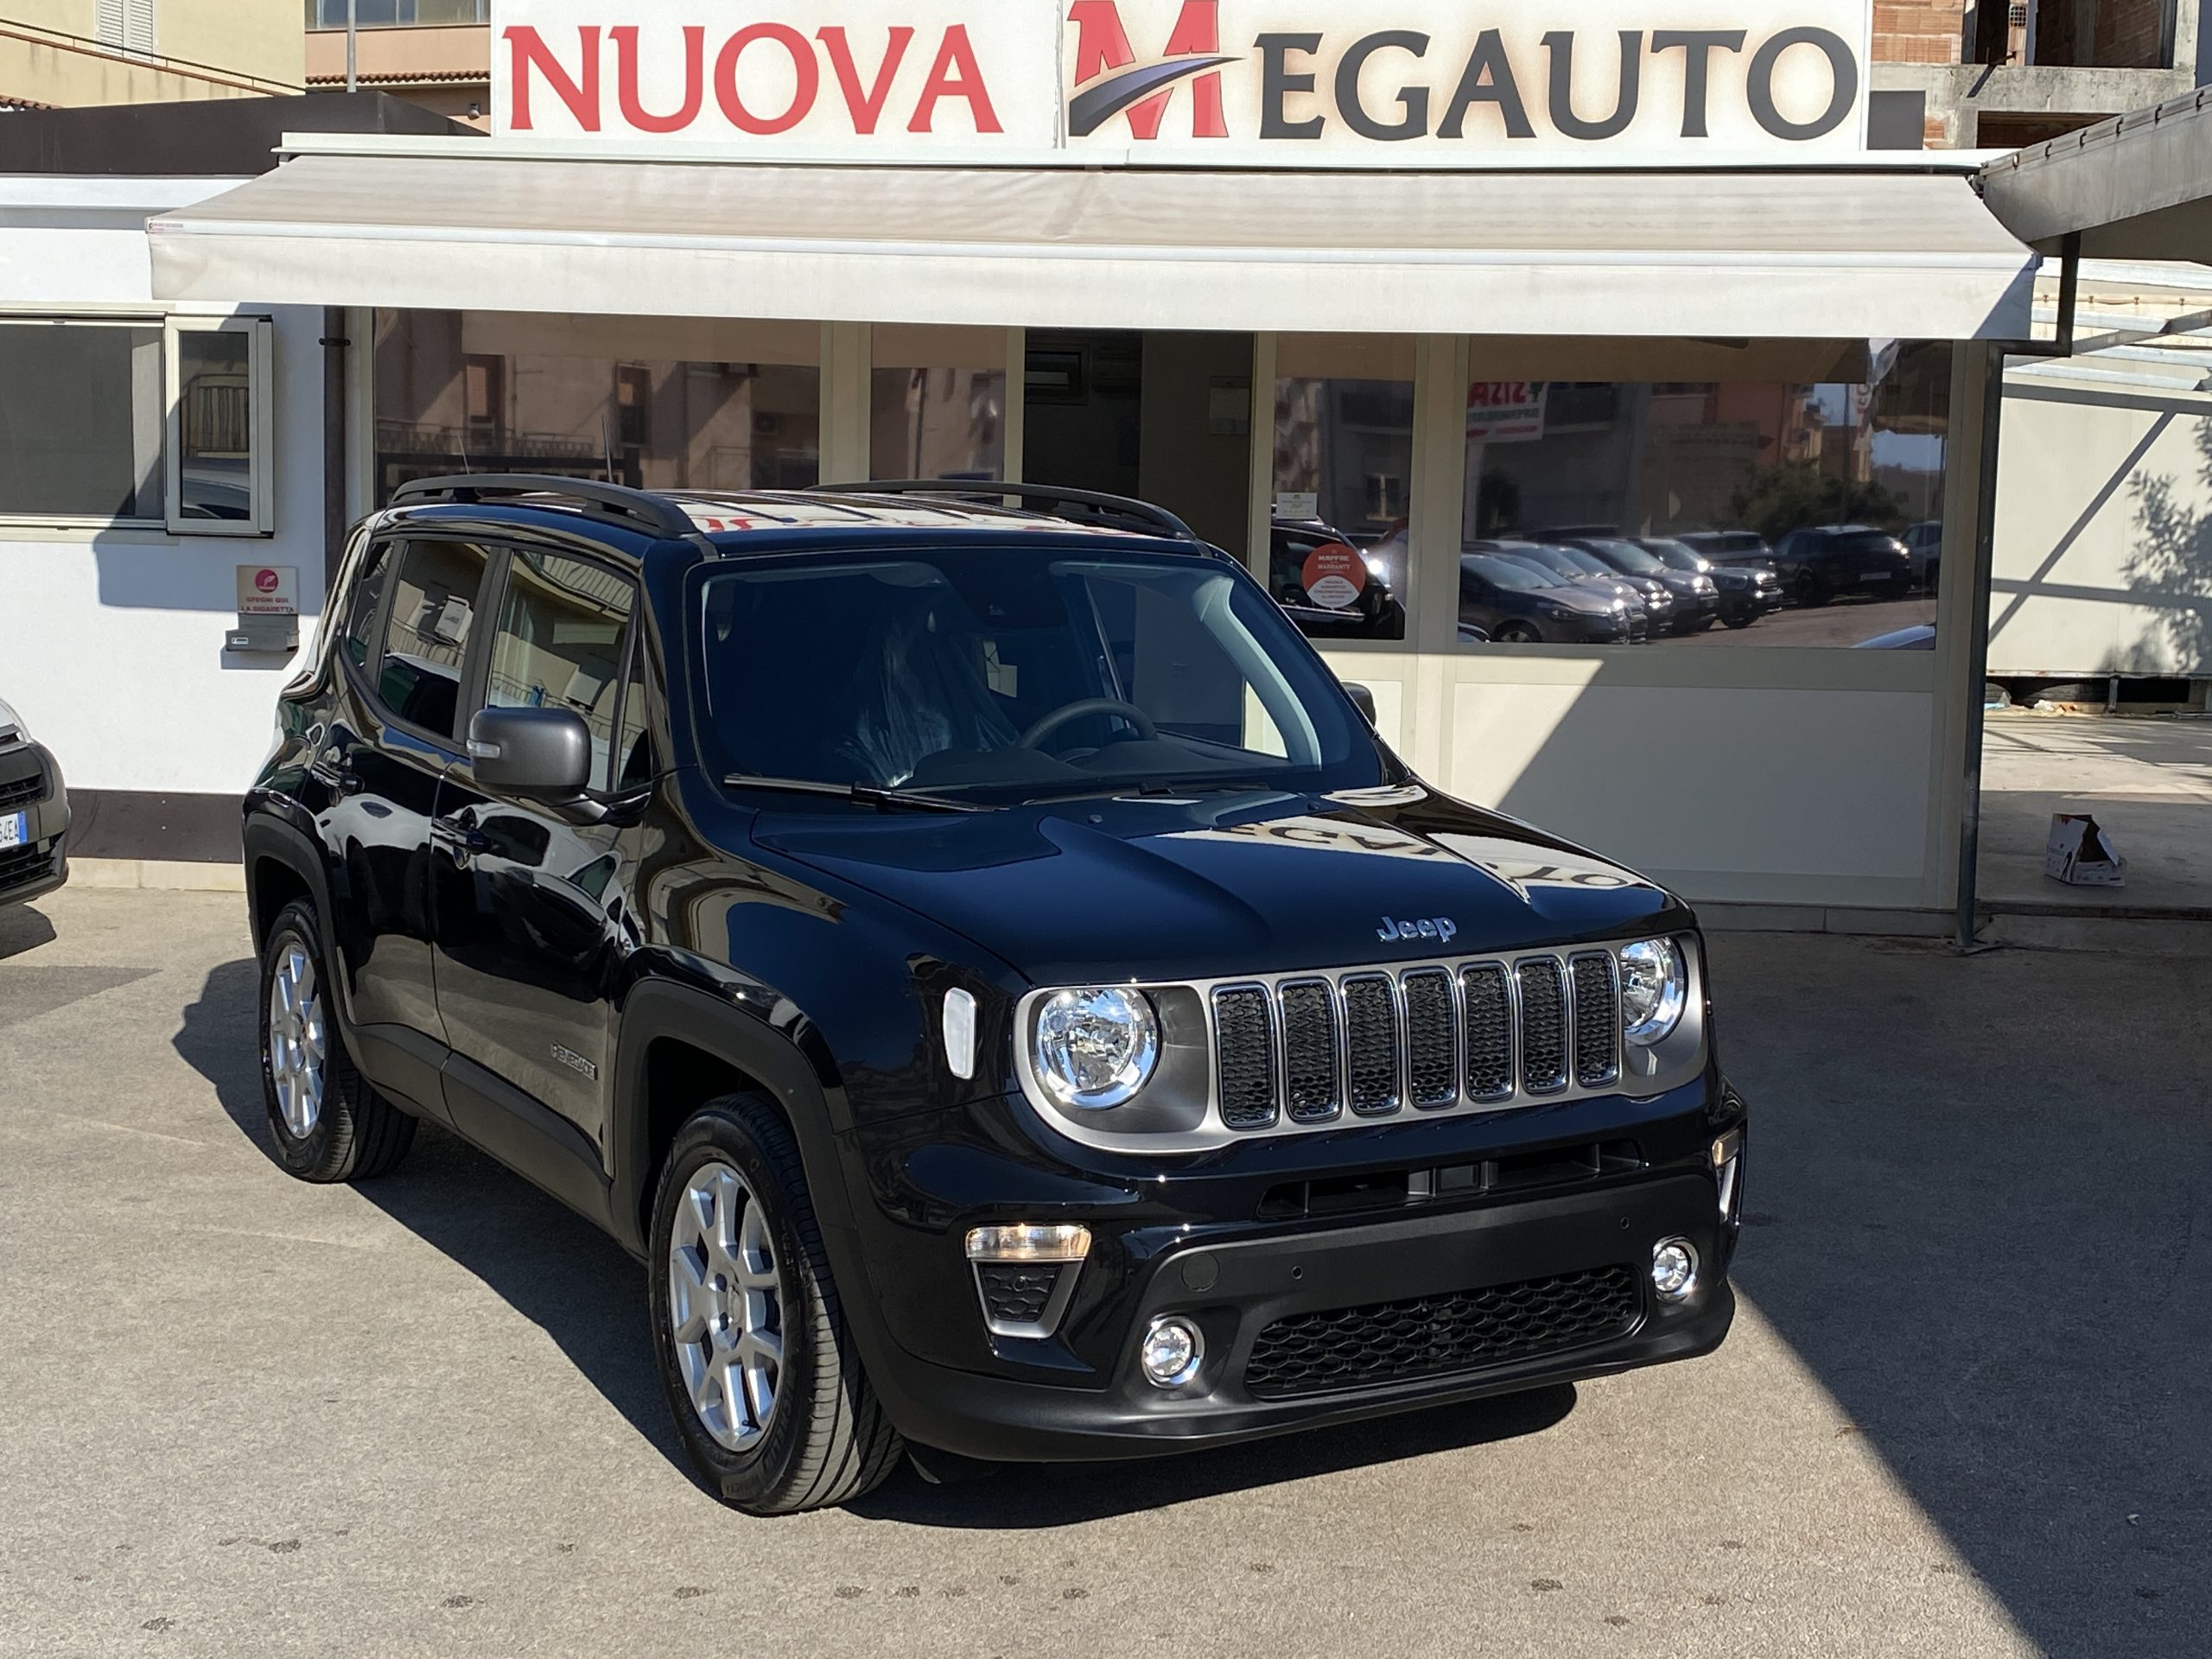 Jeep Renegade 1.6 Mjt LIMITED 130CV My2021 Km0 NAVI